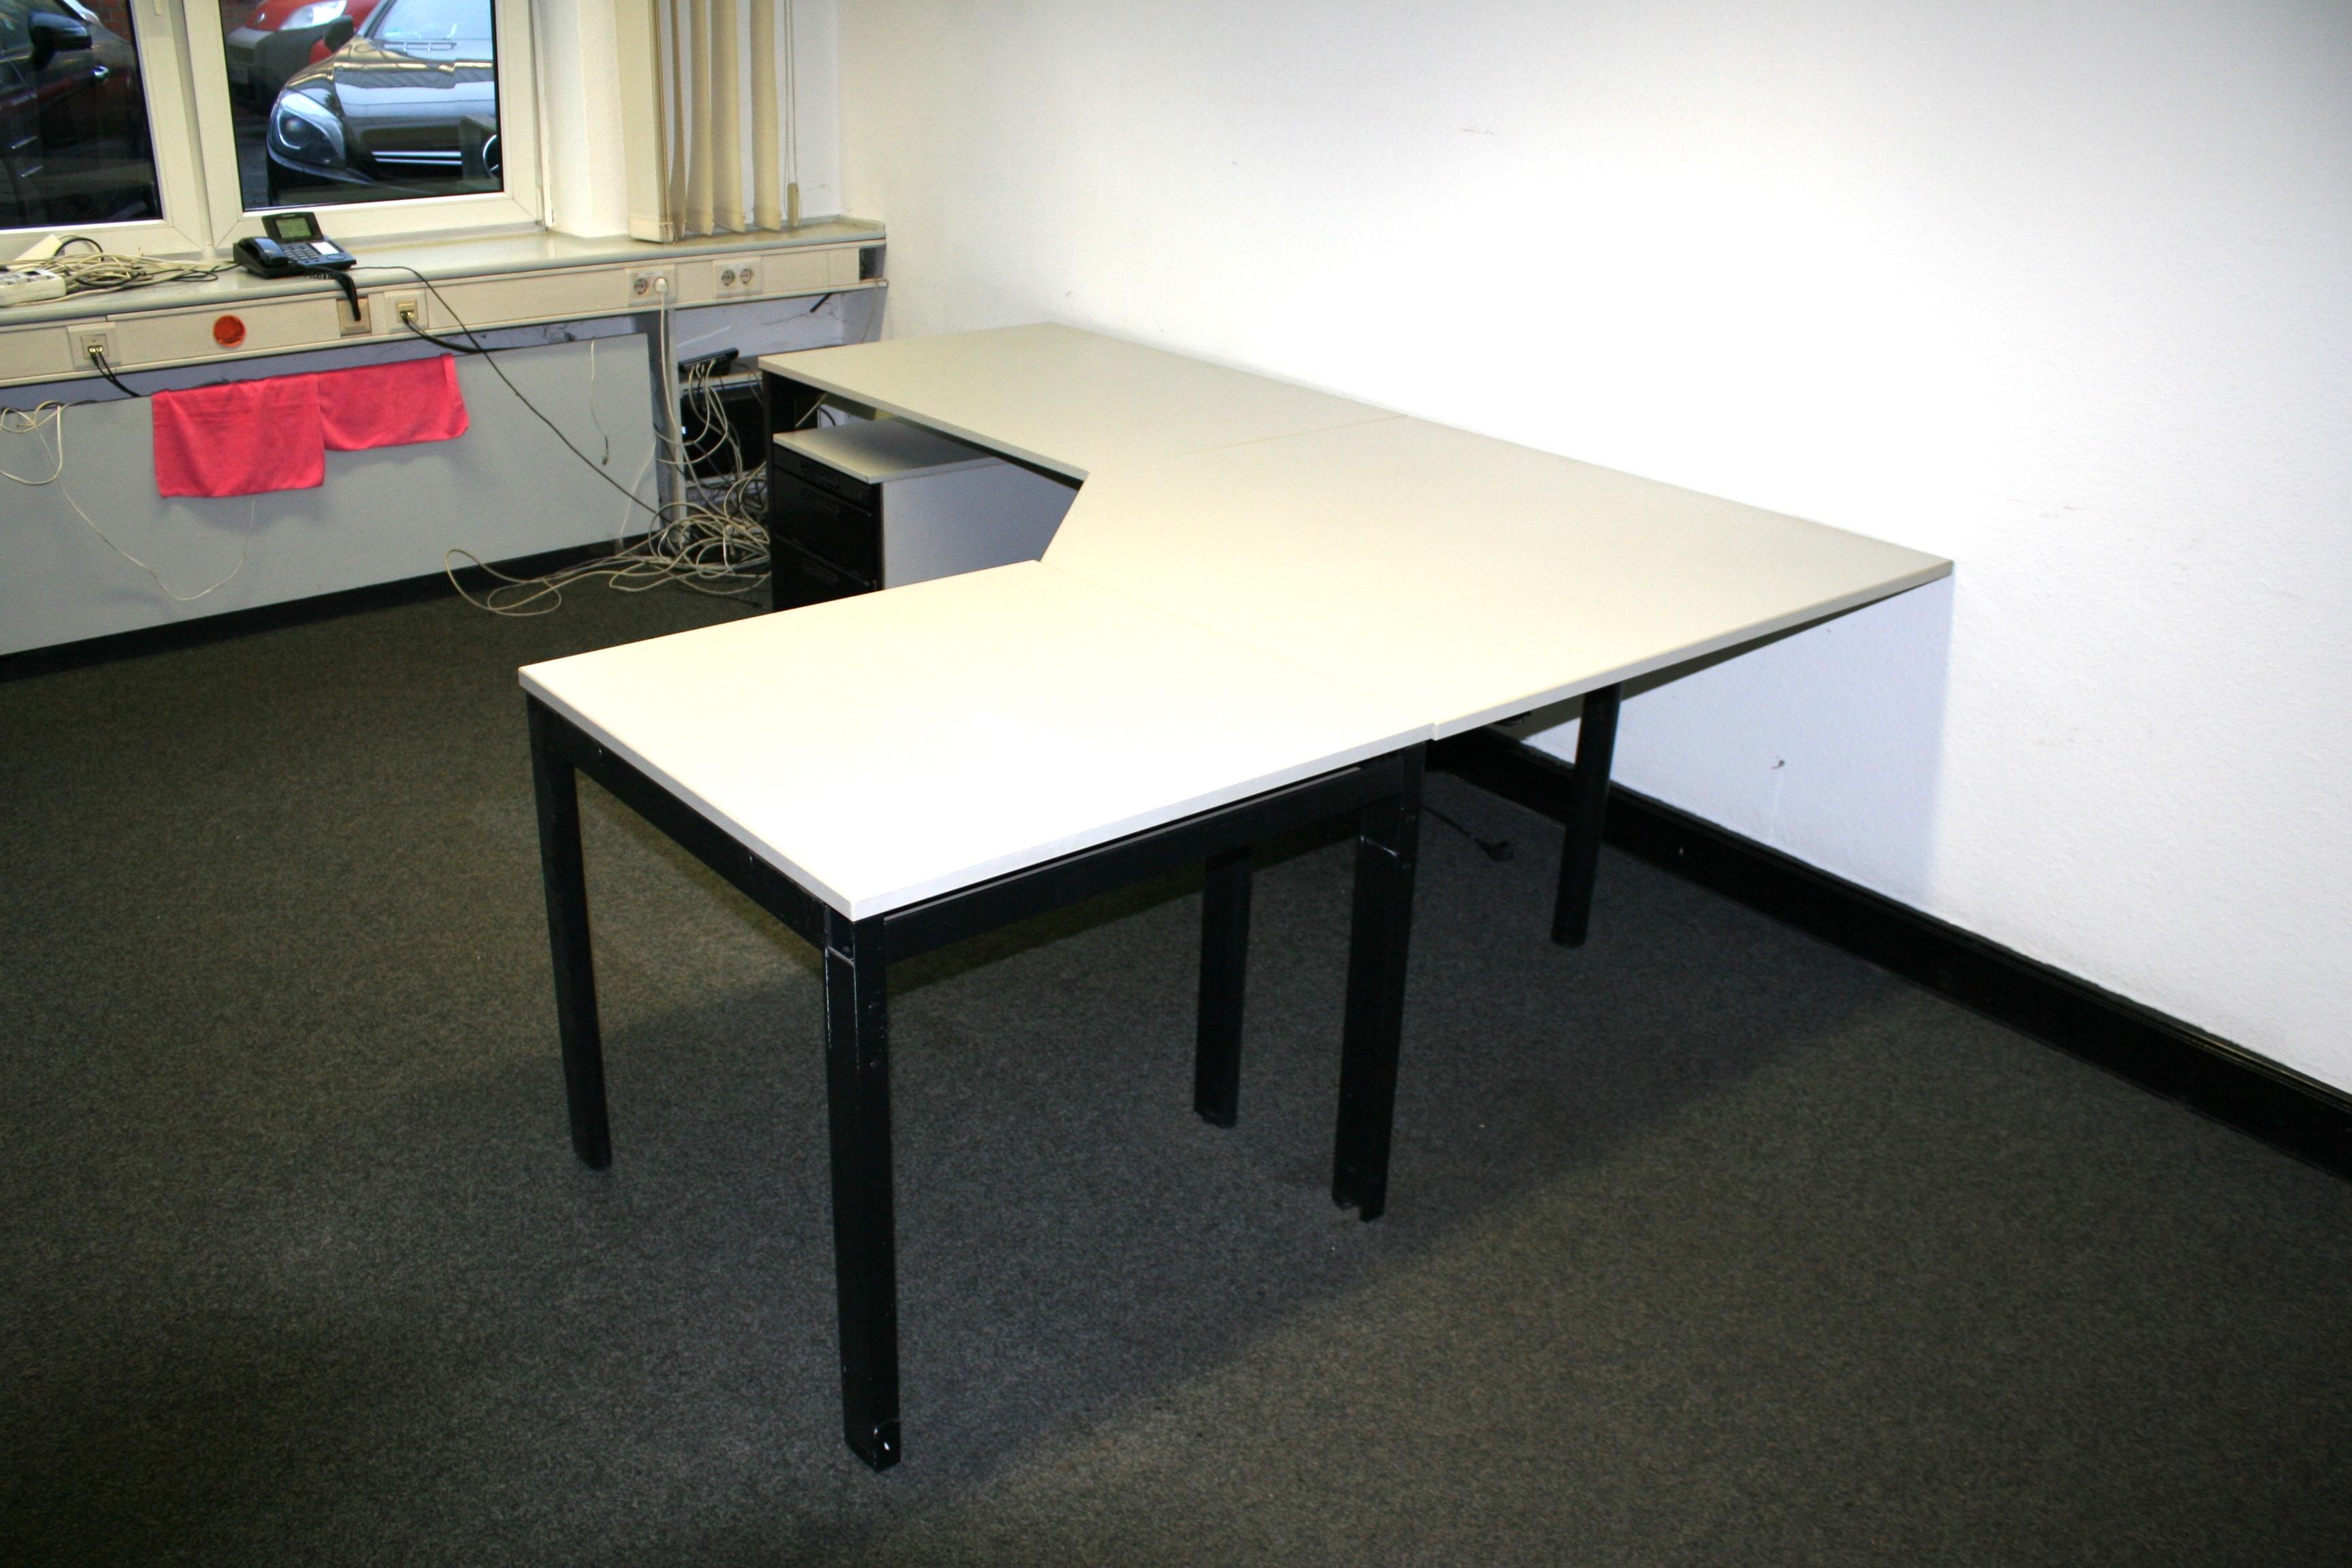 voko winkelschreibtisch 3 teilig lichtgrau incl. Black Bedroom Furniture Sets. Home Design Ideas